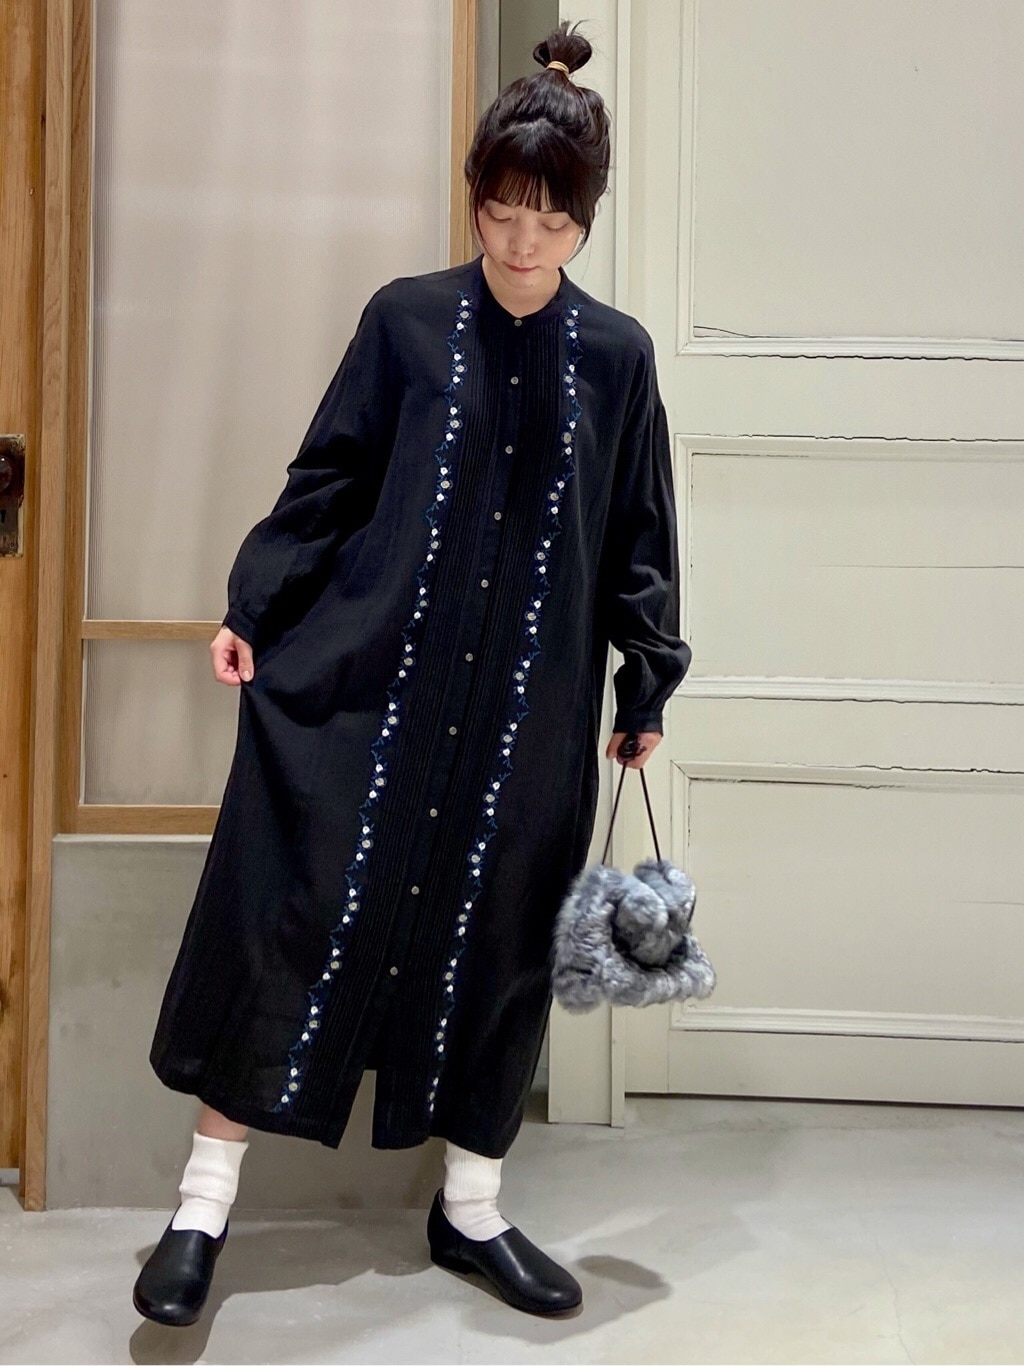 bulle de savon 渋谷スクランブルスクエア 身長:153cm 2021.01.08